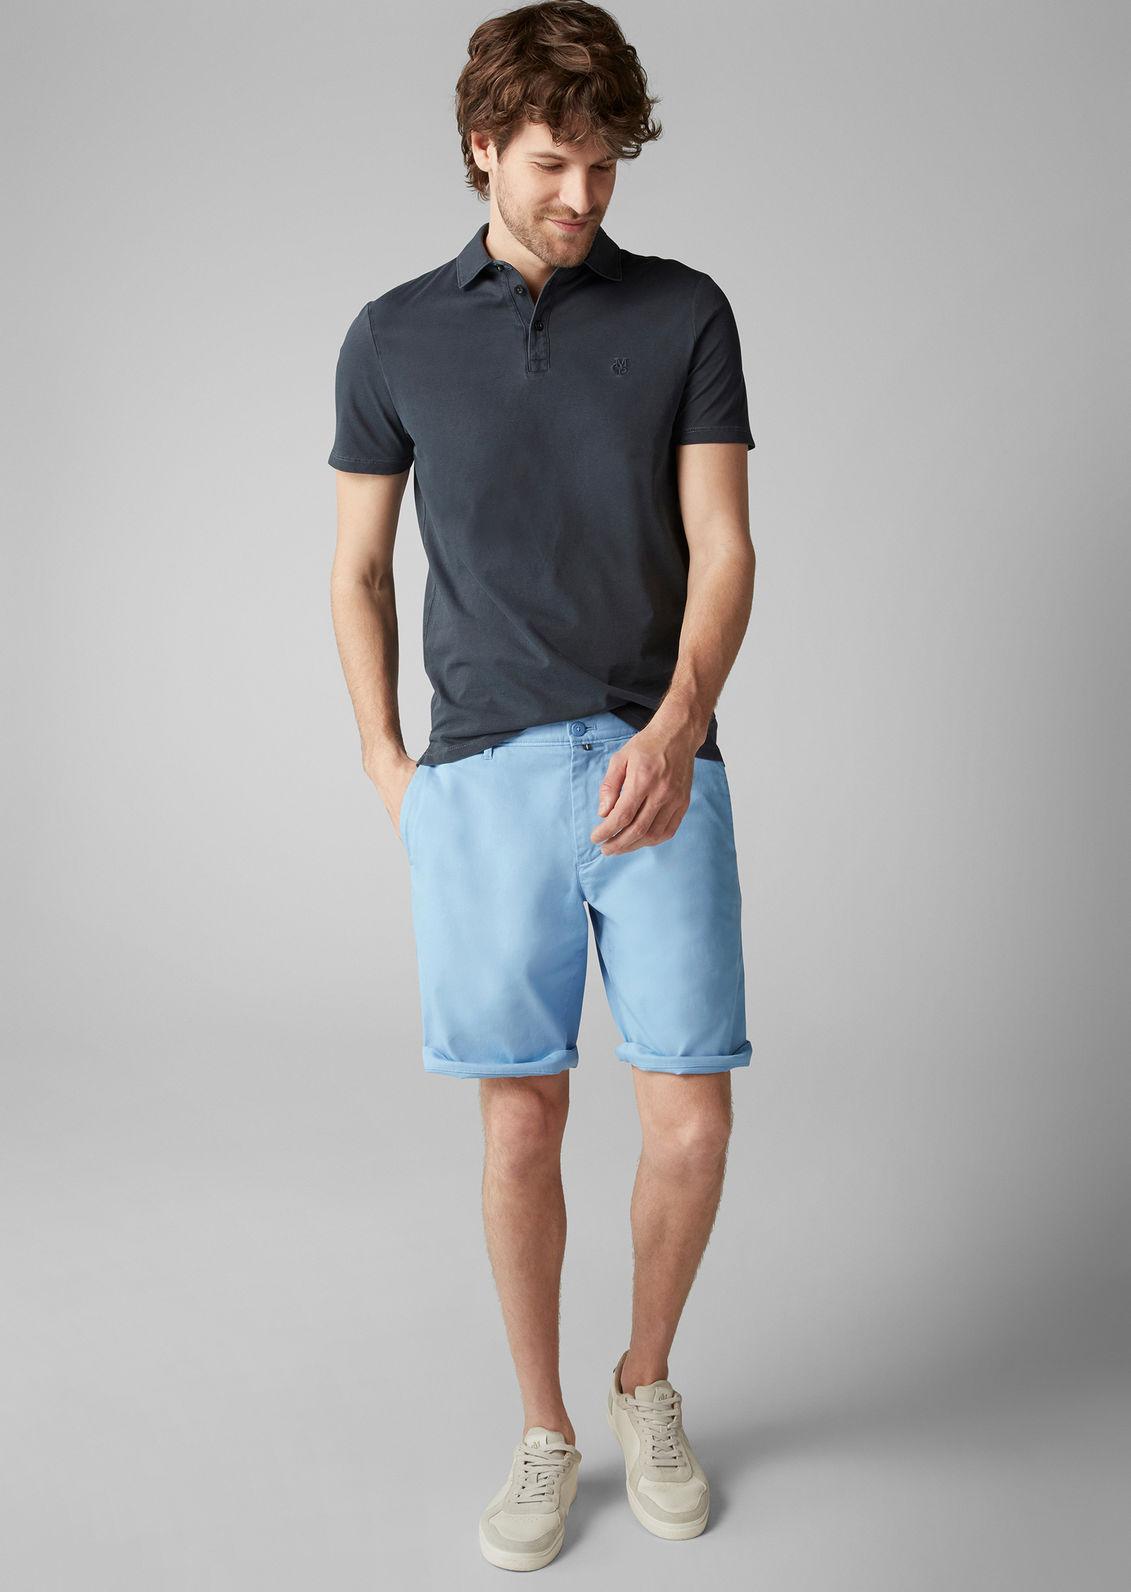 Koszulka Marc O'Polo M24221053028 Rozm.L -60%!